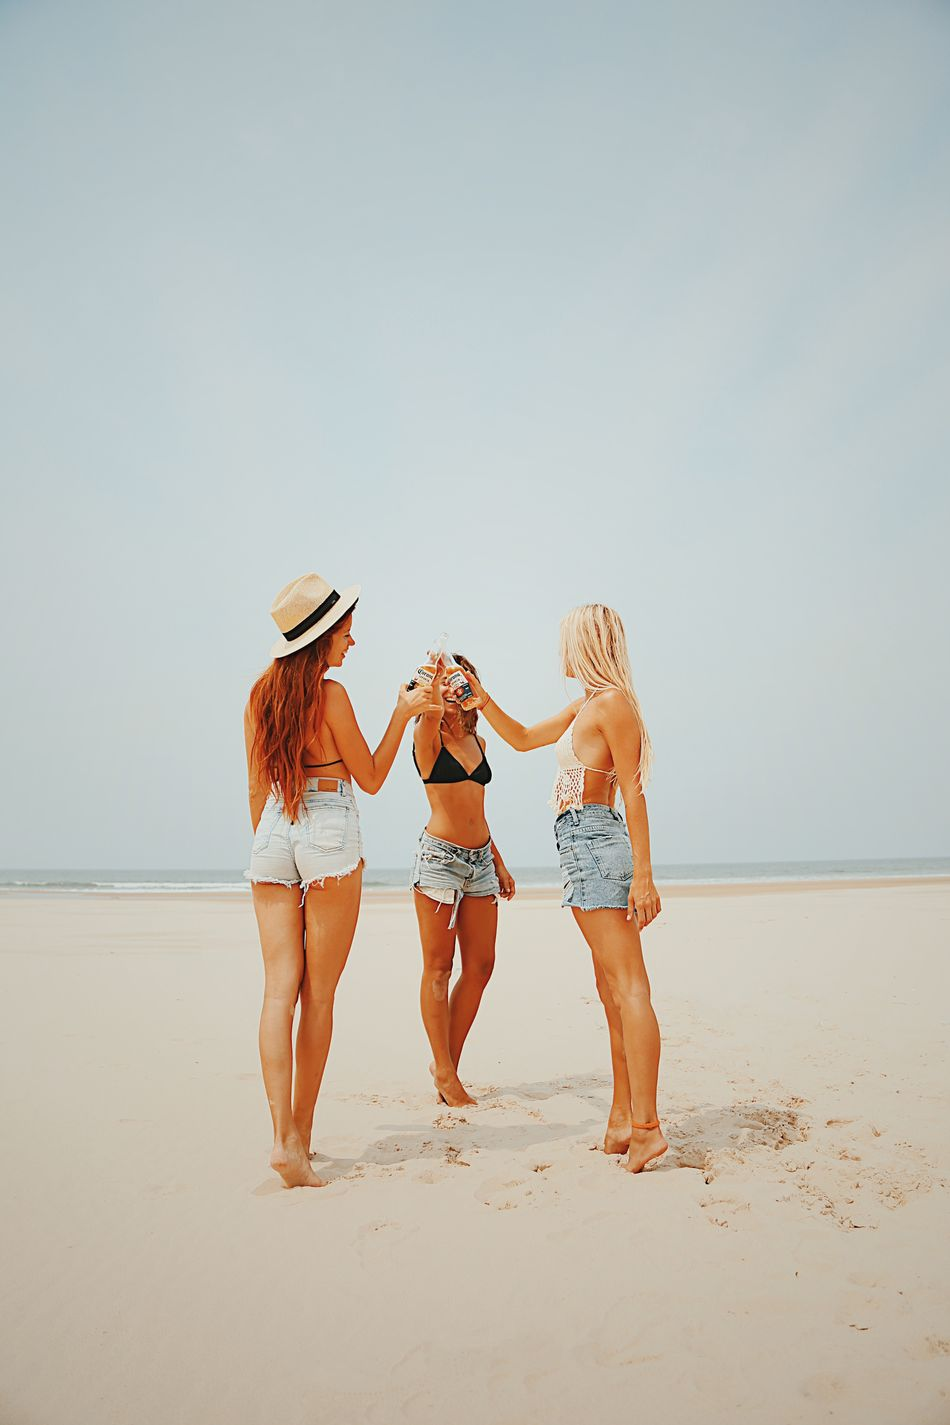 Beautiful stock photos of freundschaft, beach, real people, sand, rear view